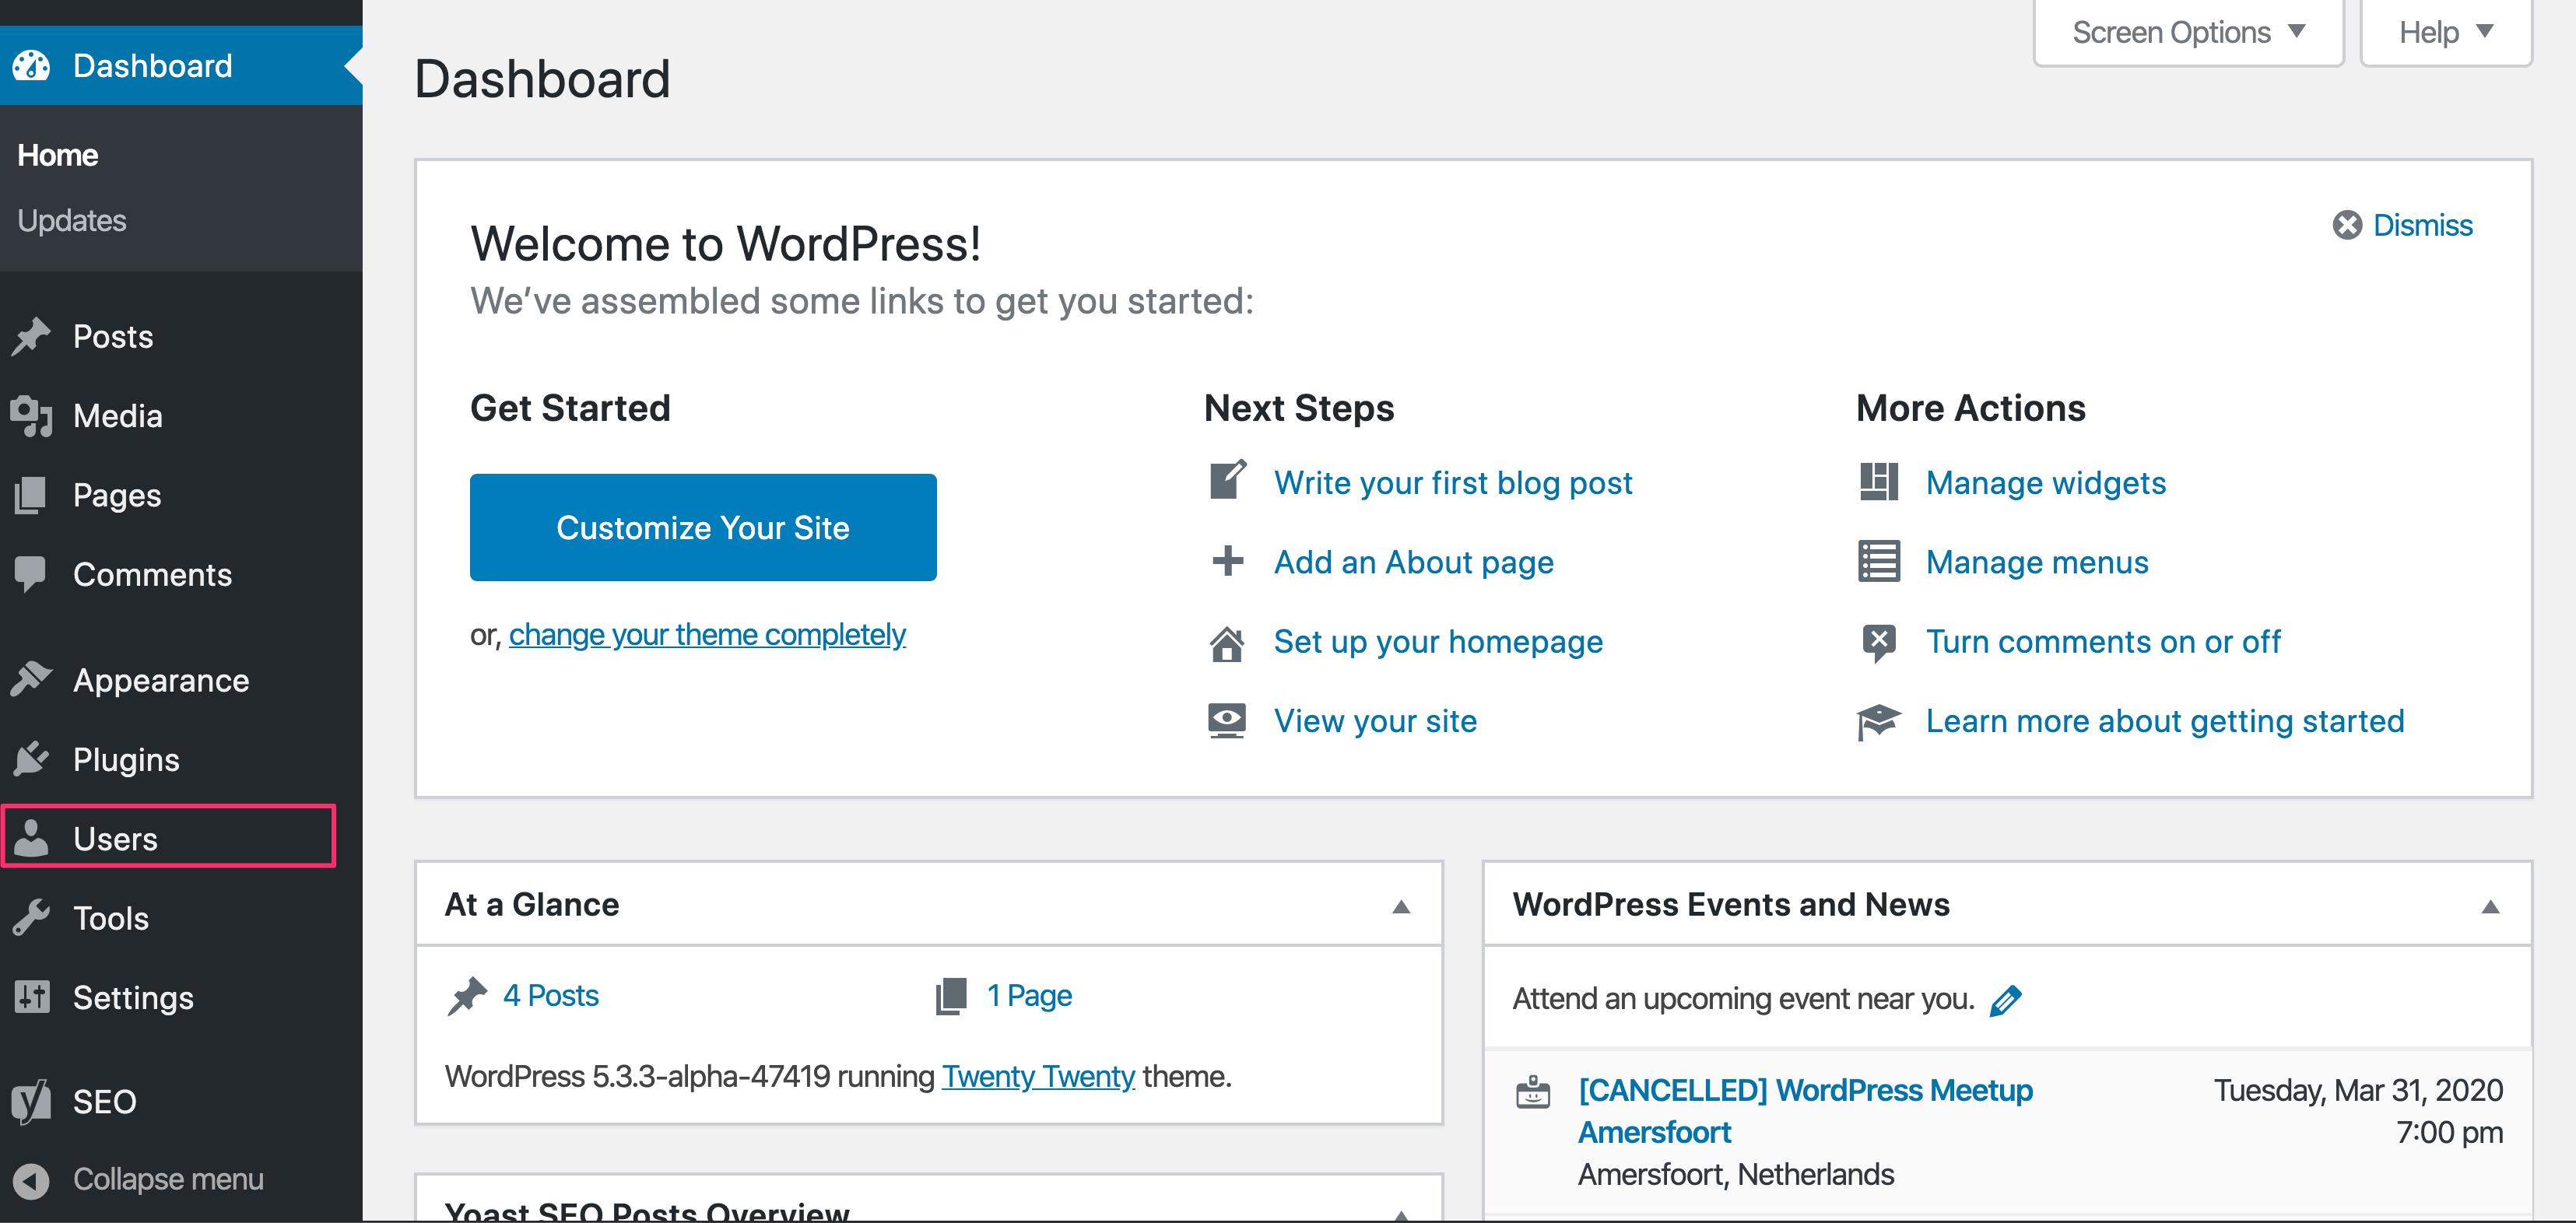 The users admin menu in WordPress